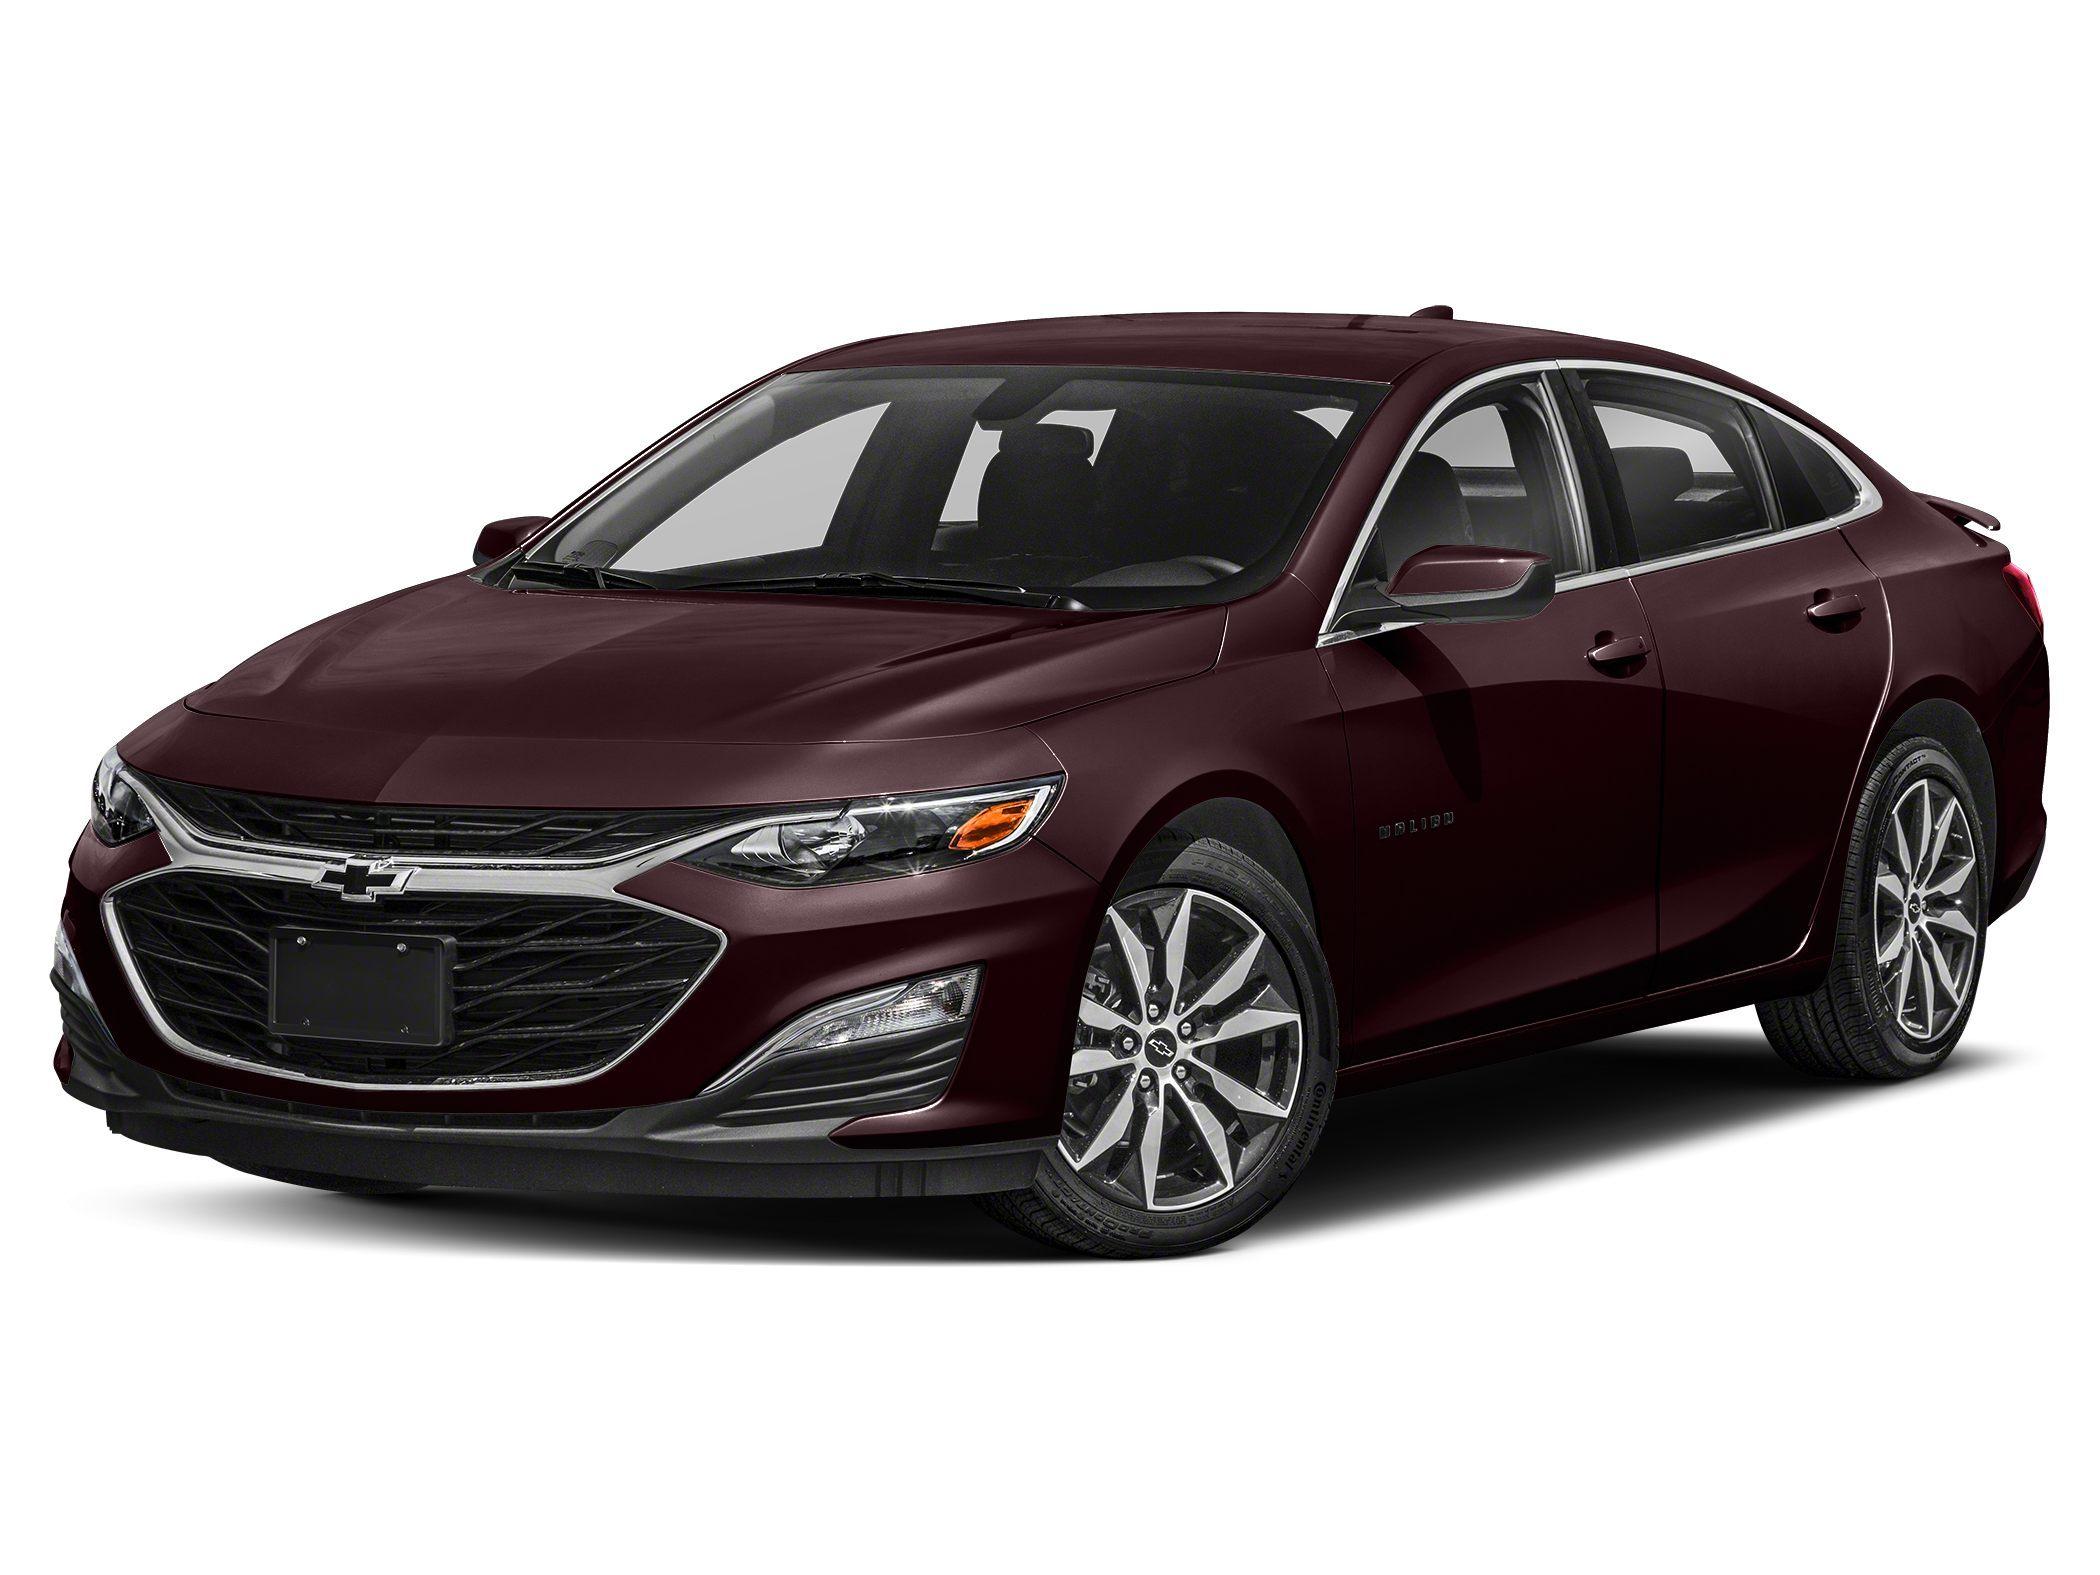 New 2021 Chevrolet Malibu For Sale at Modern Automotive ...